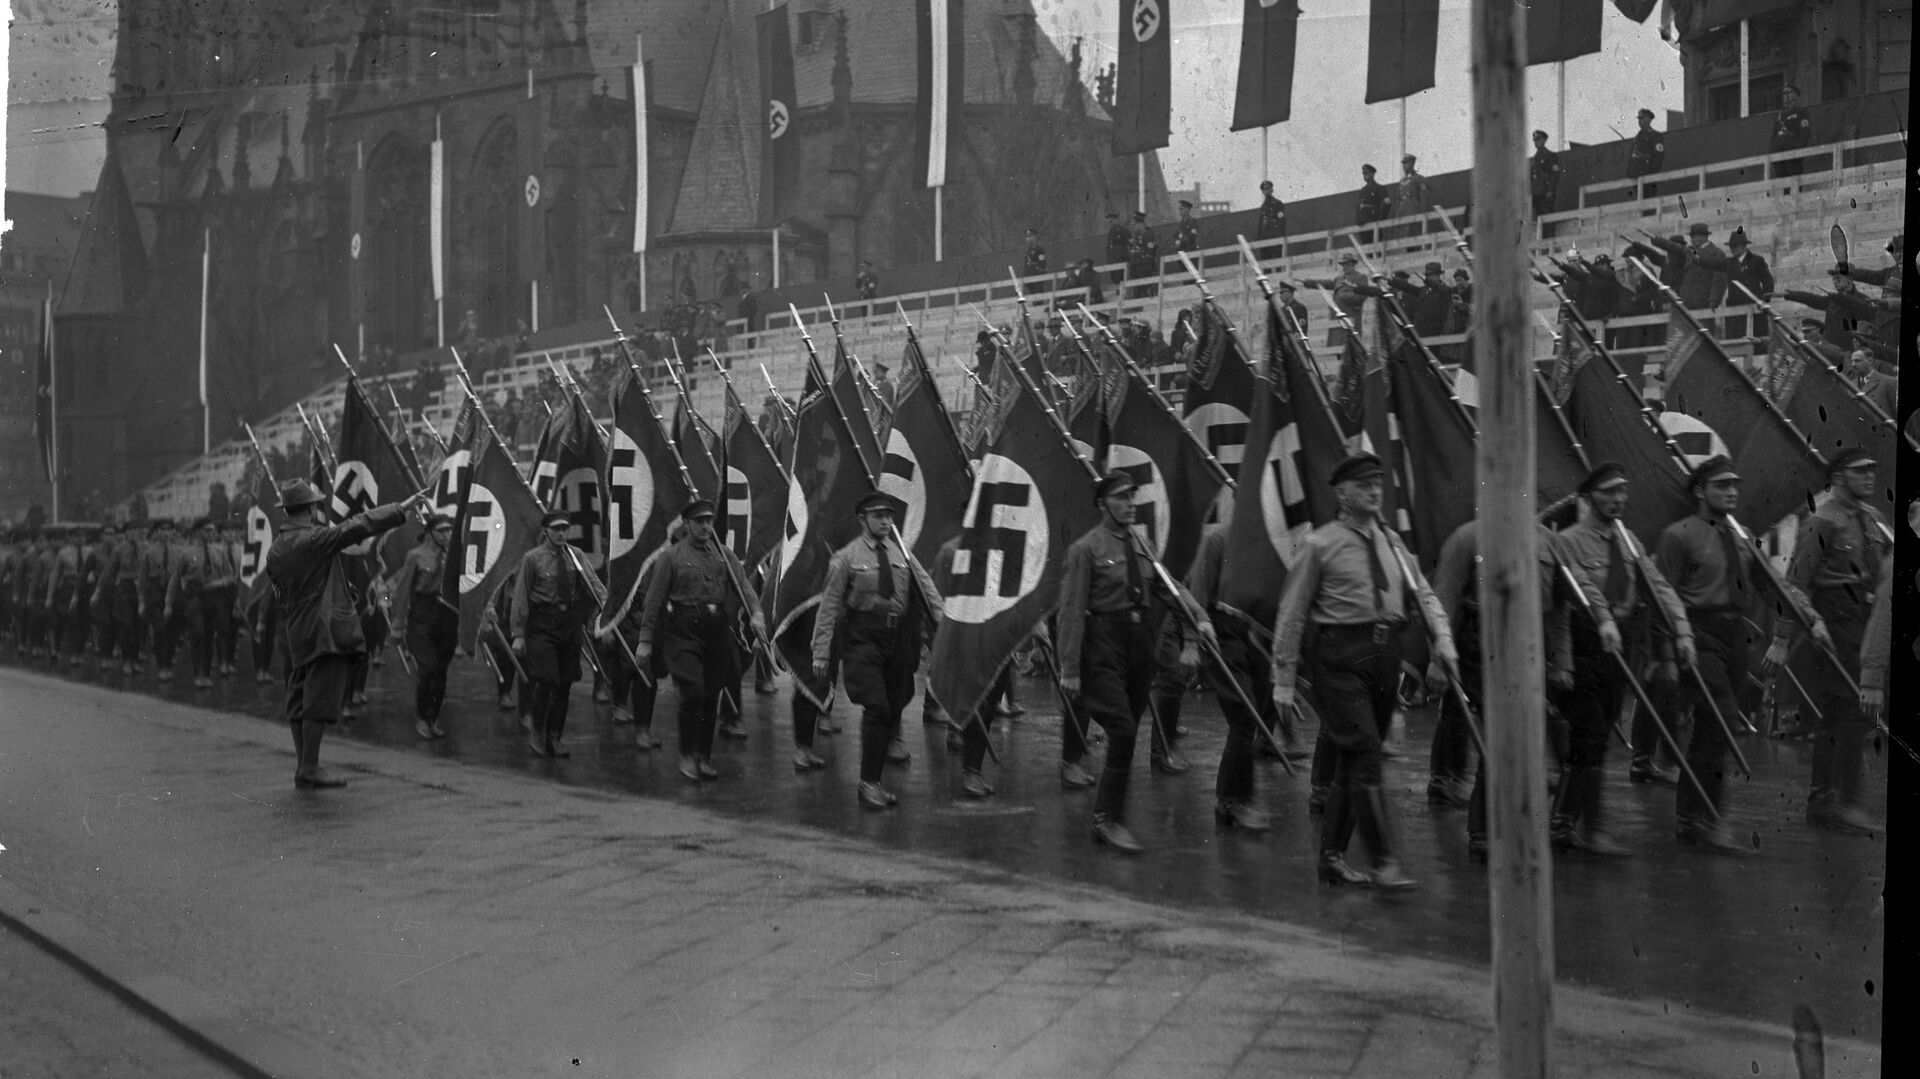 Un desfile militar nazi en Alemania en 1939 - Sputnik Mundo, 1920, 12.04.2021